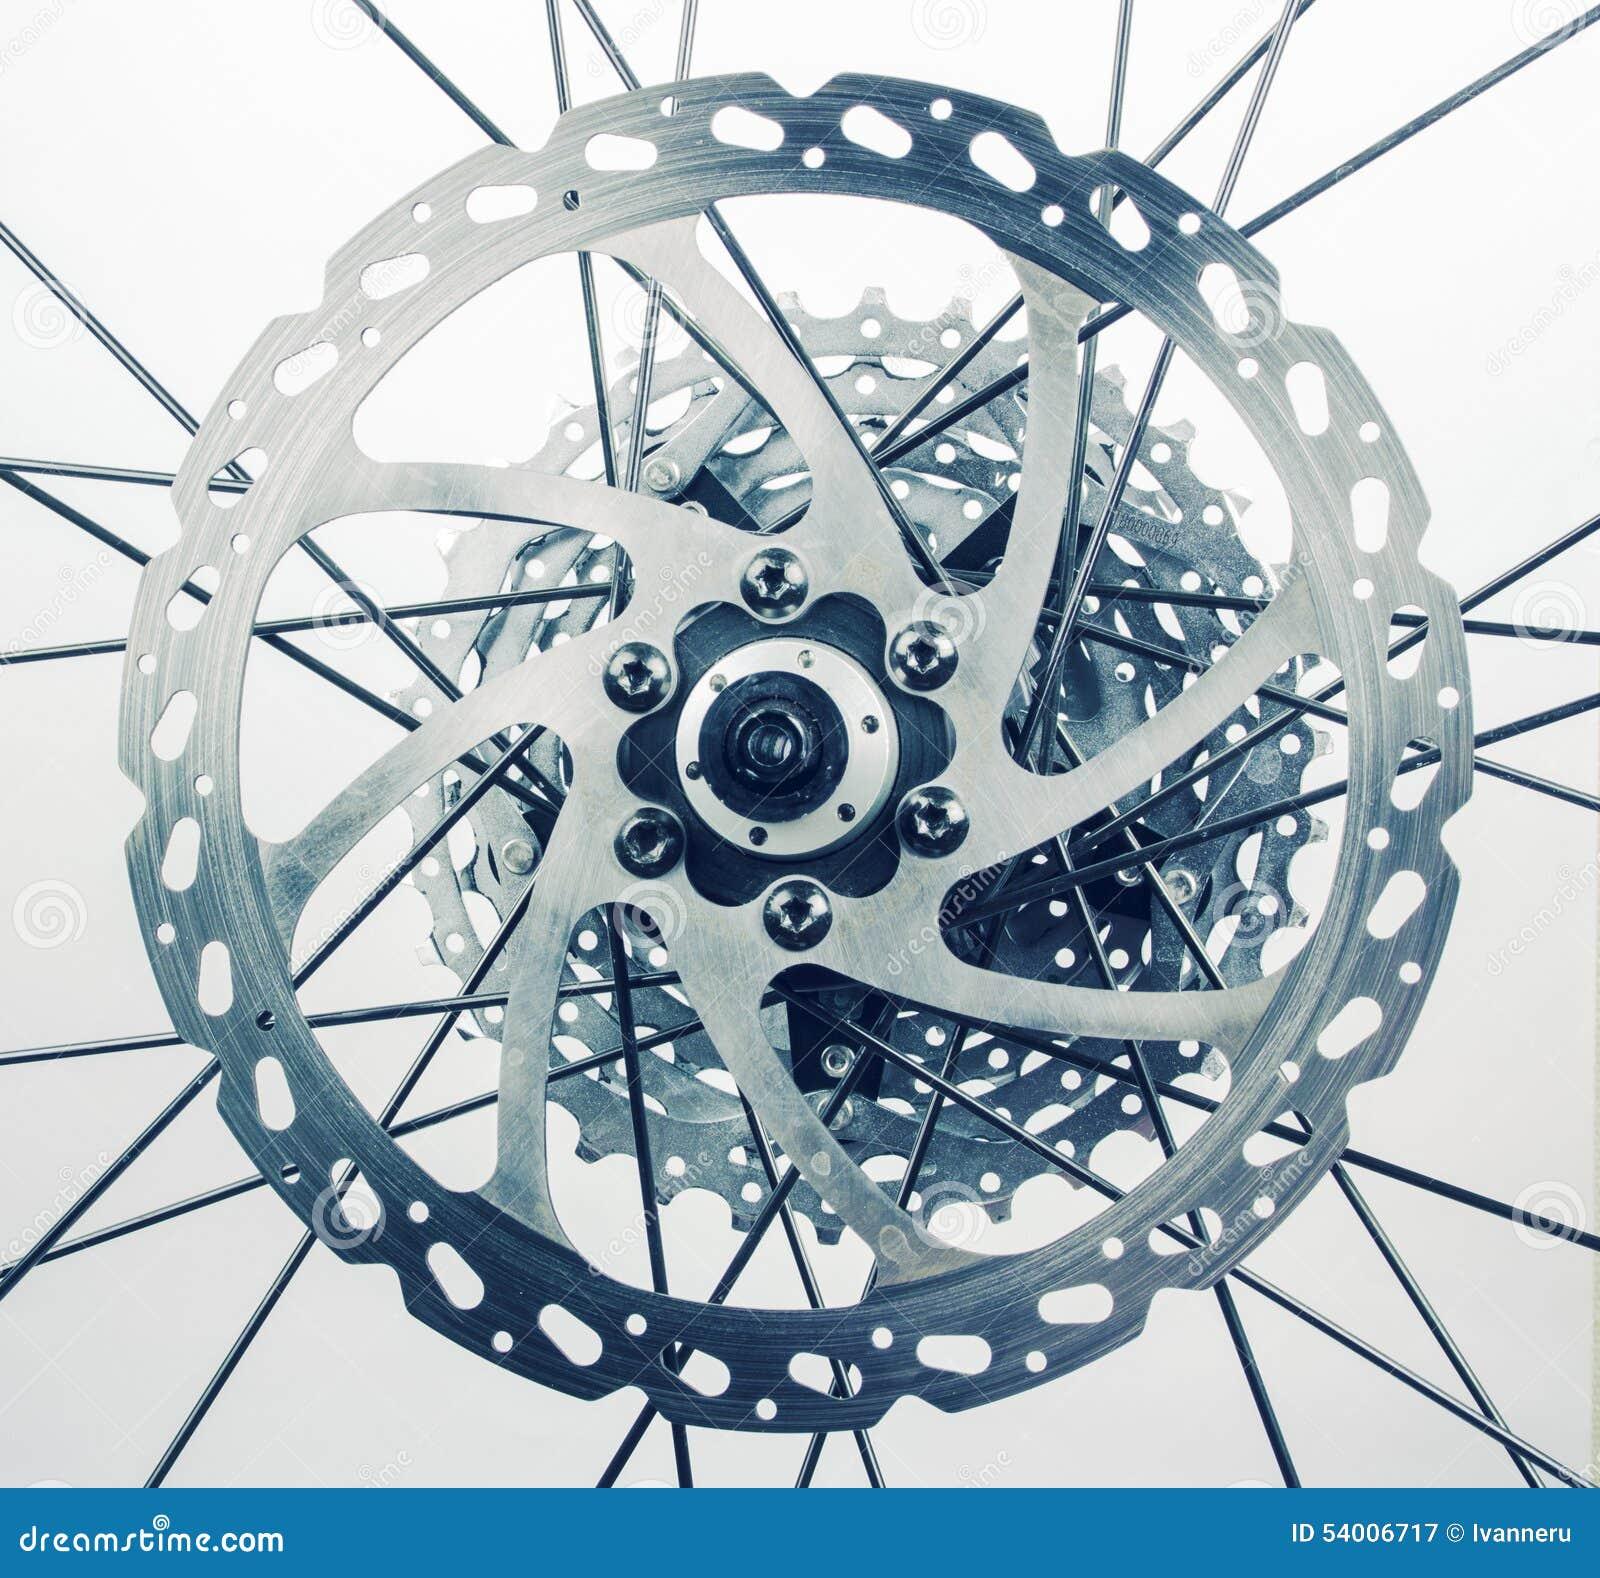 Bike Parts Stock Image Image Of Transportation Bike 54006717